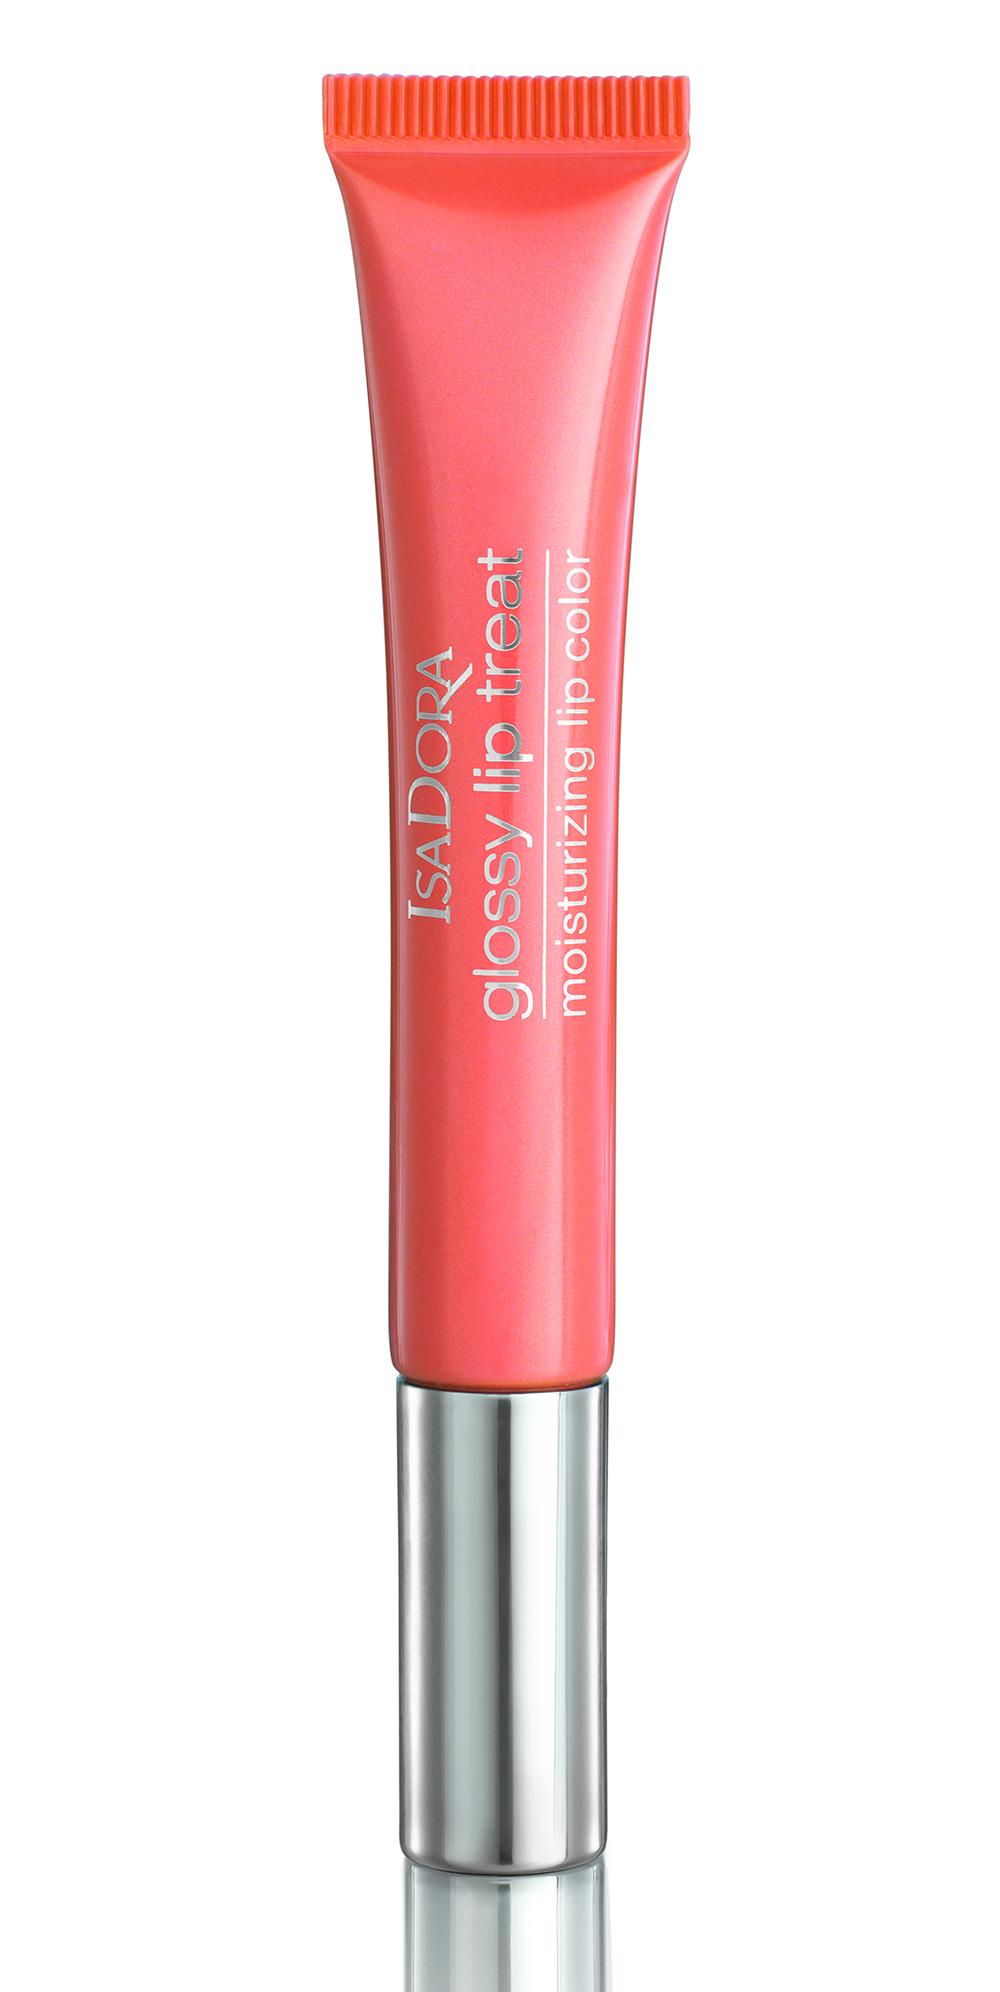 IsaDora 66 Papaya Sparkle Glossy Lip Treat Bronzing Collection 2020